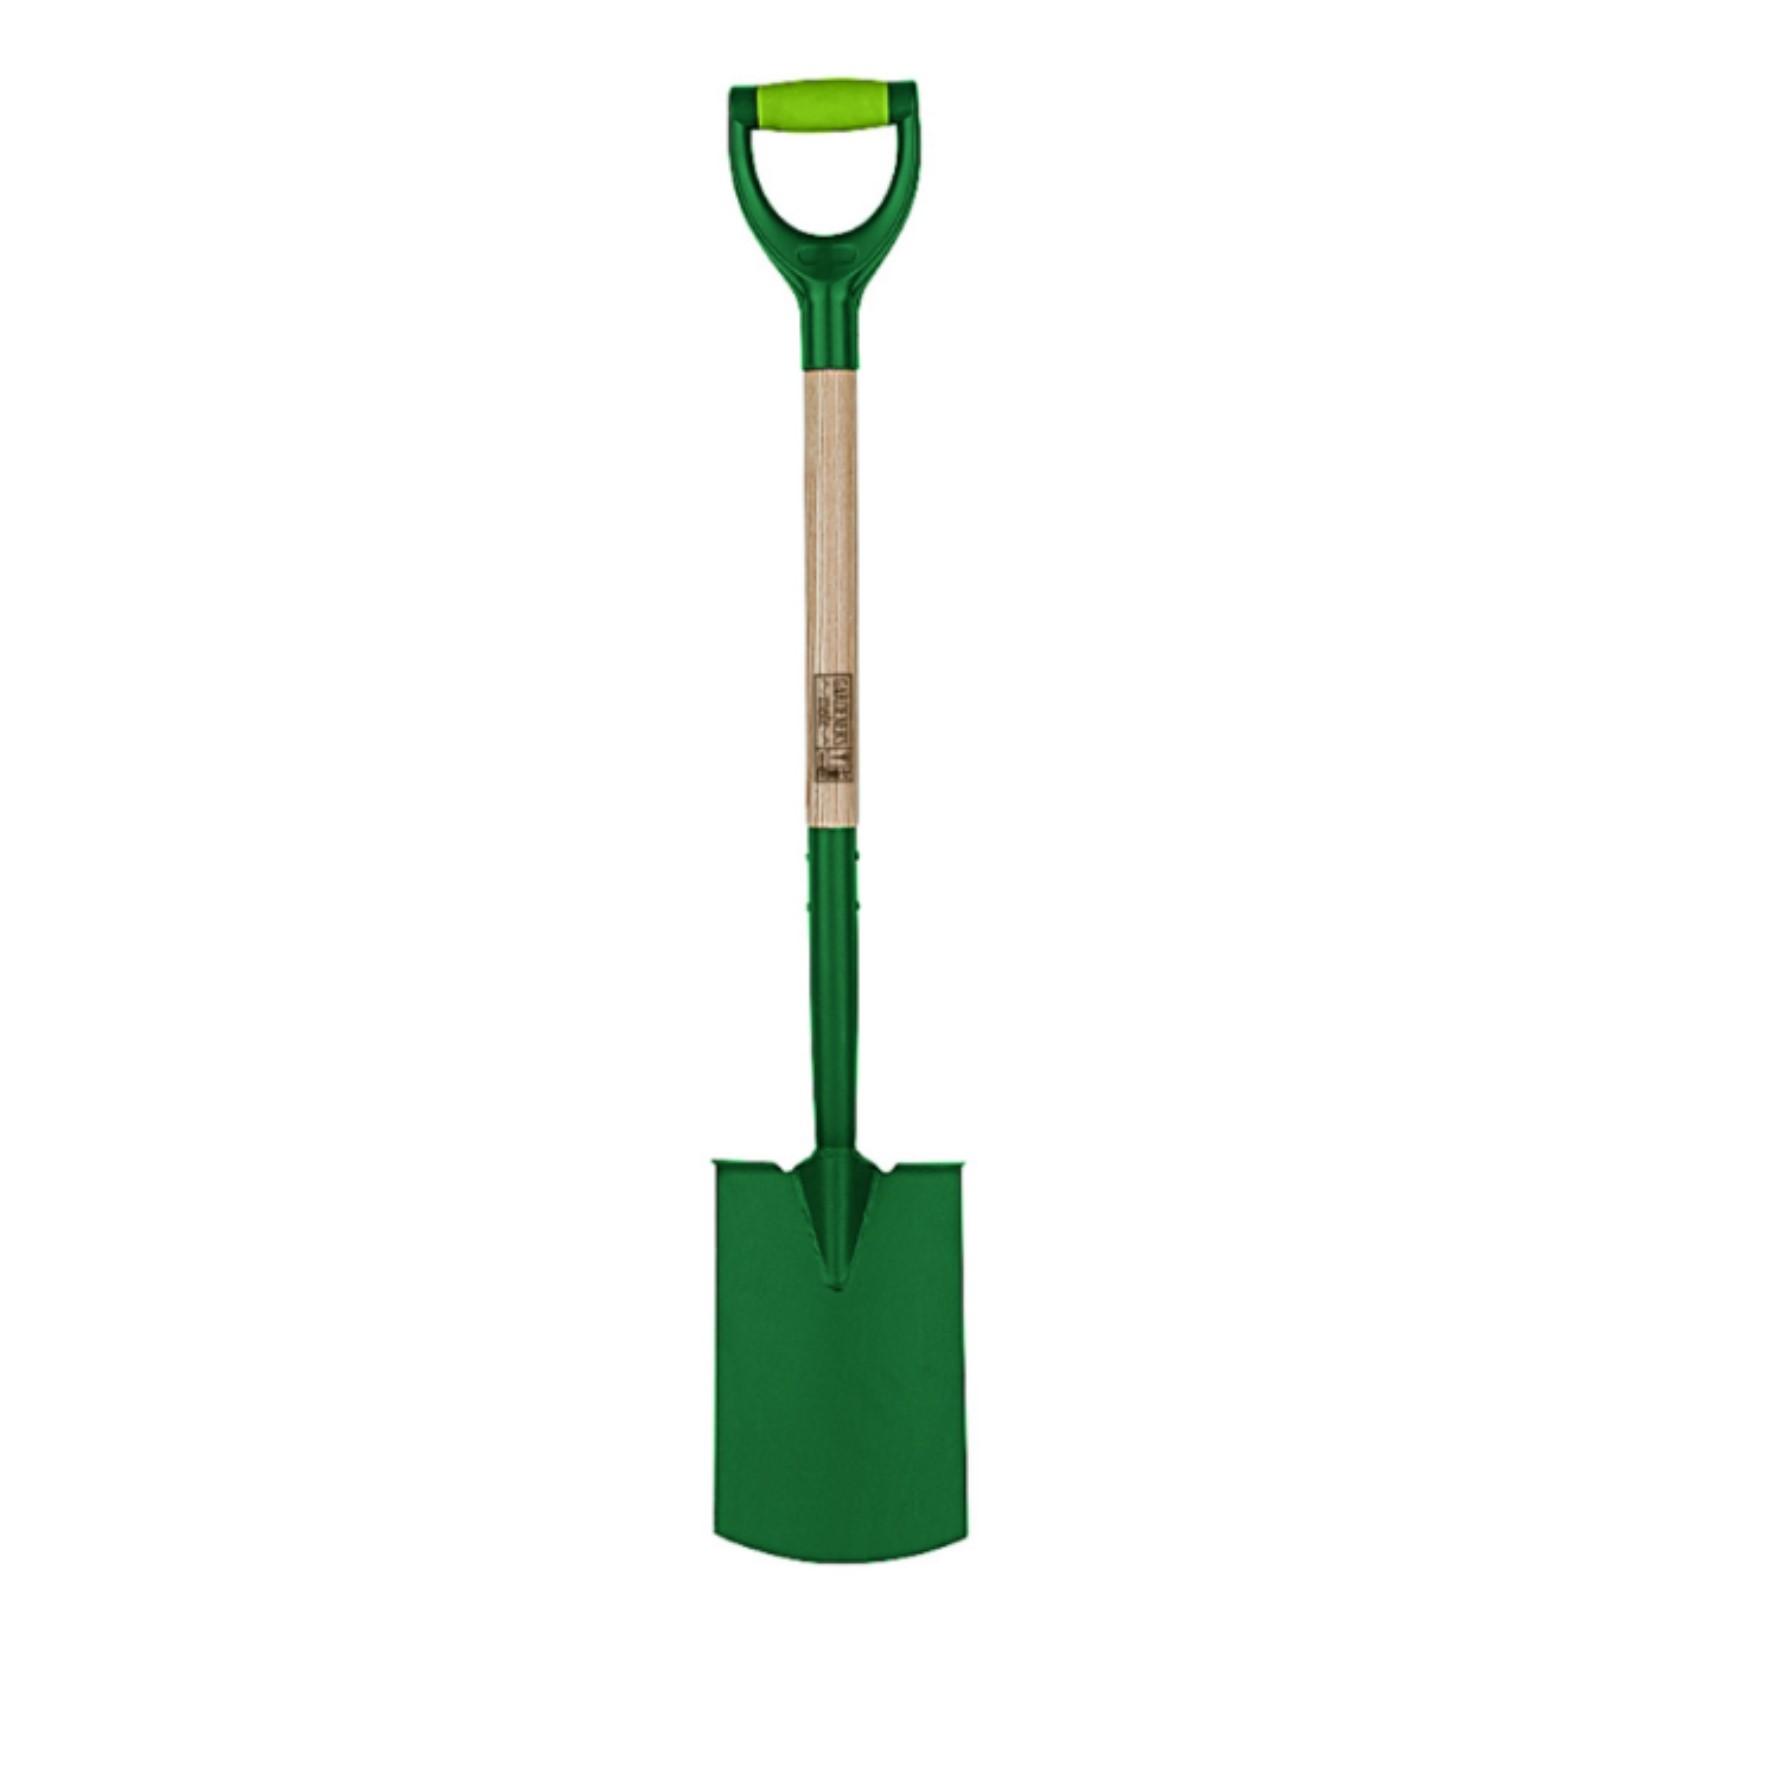 digging spade - green end